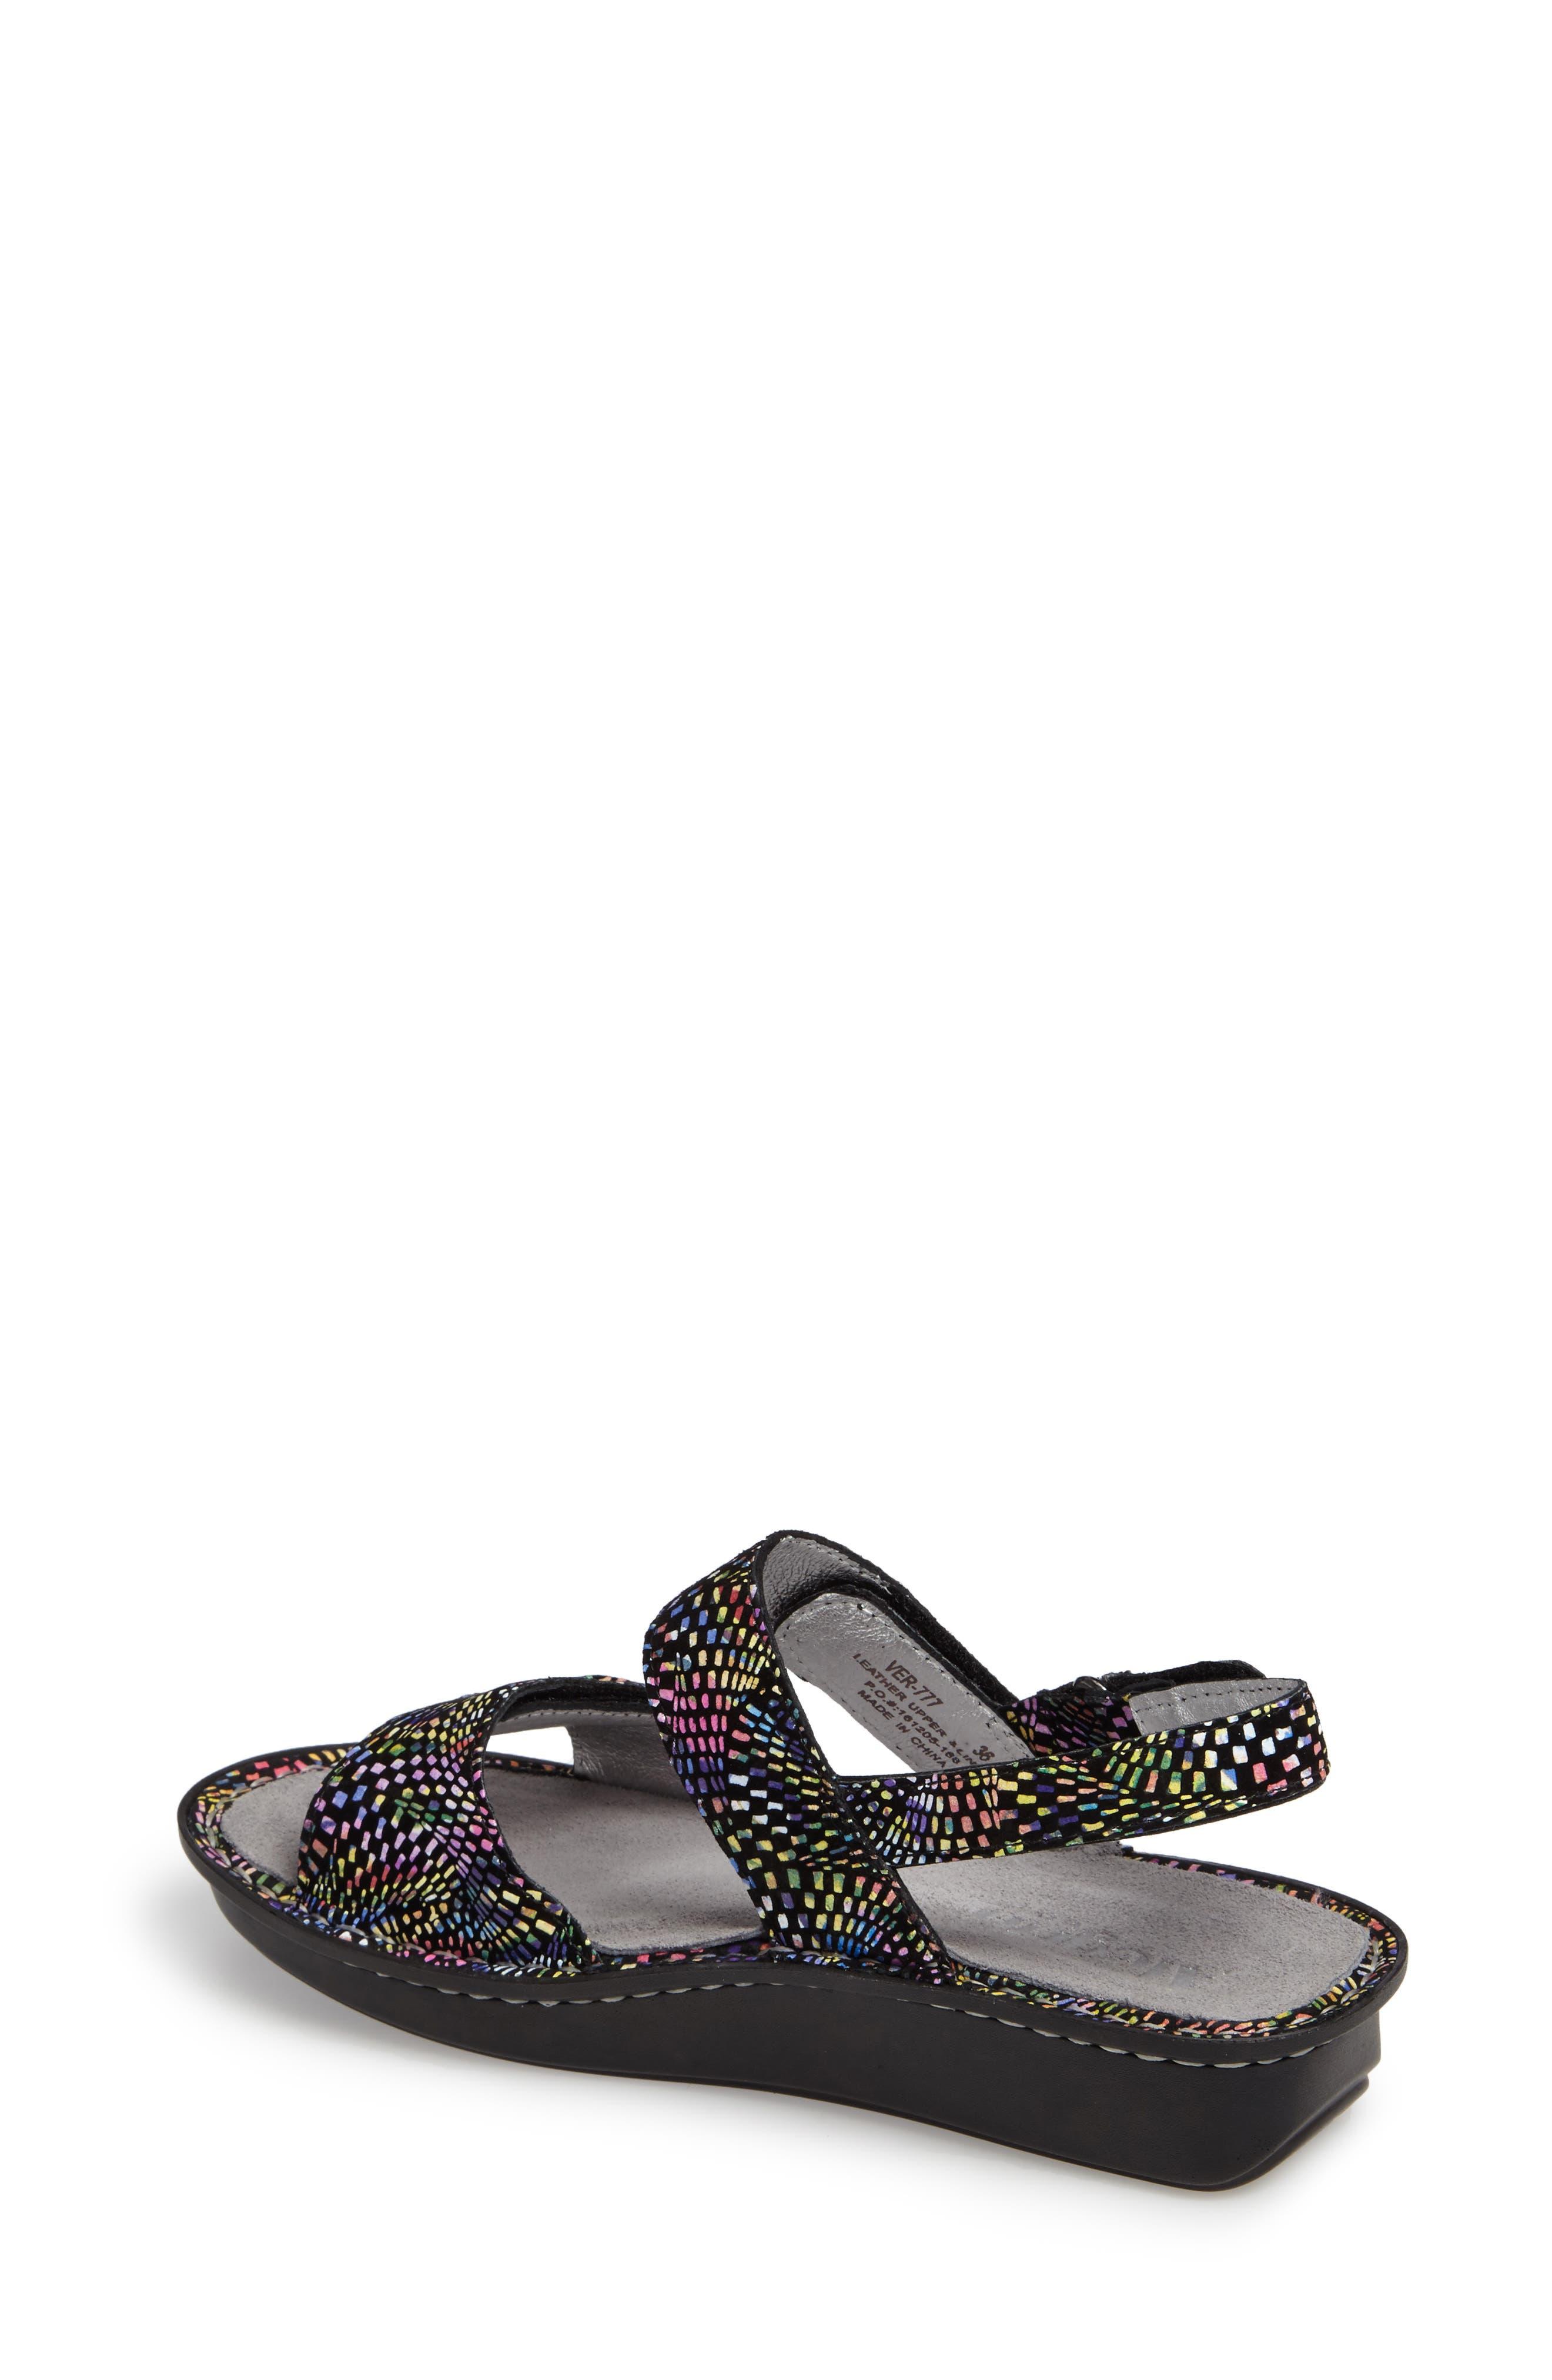 Alternate Image 2  - Alegria 'Verona' Sandal (Women)